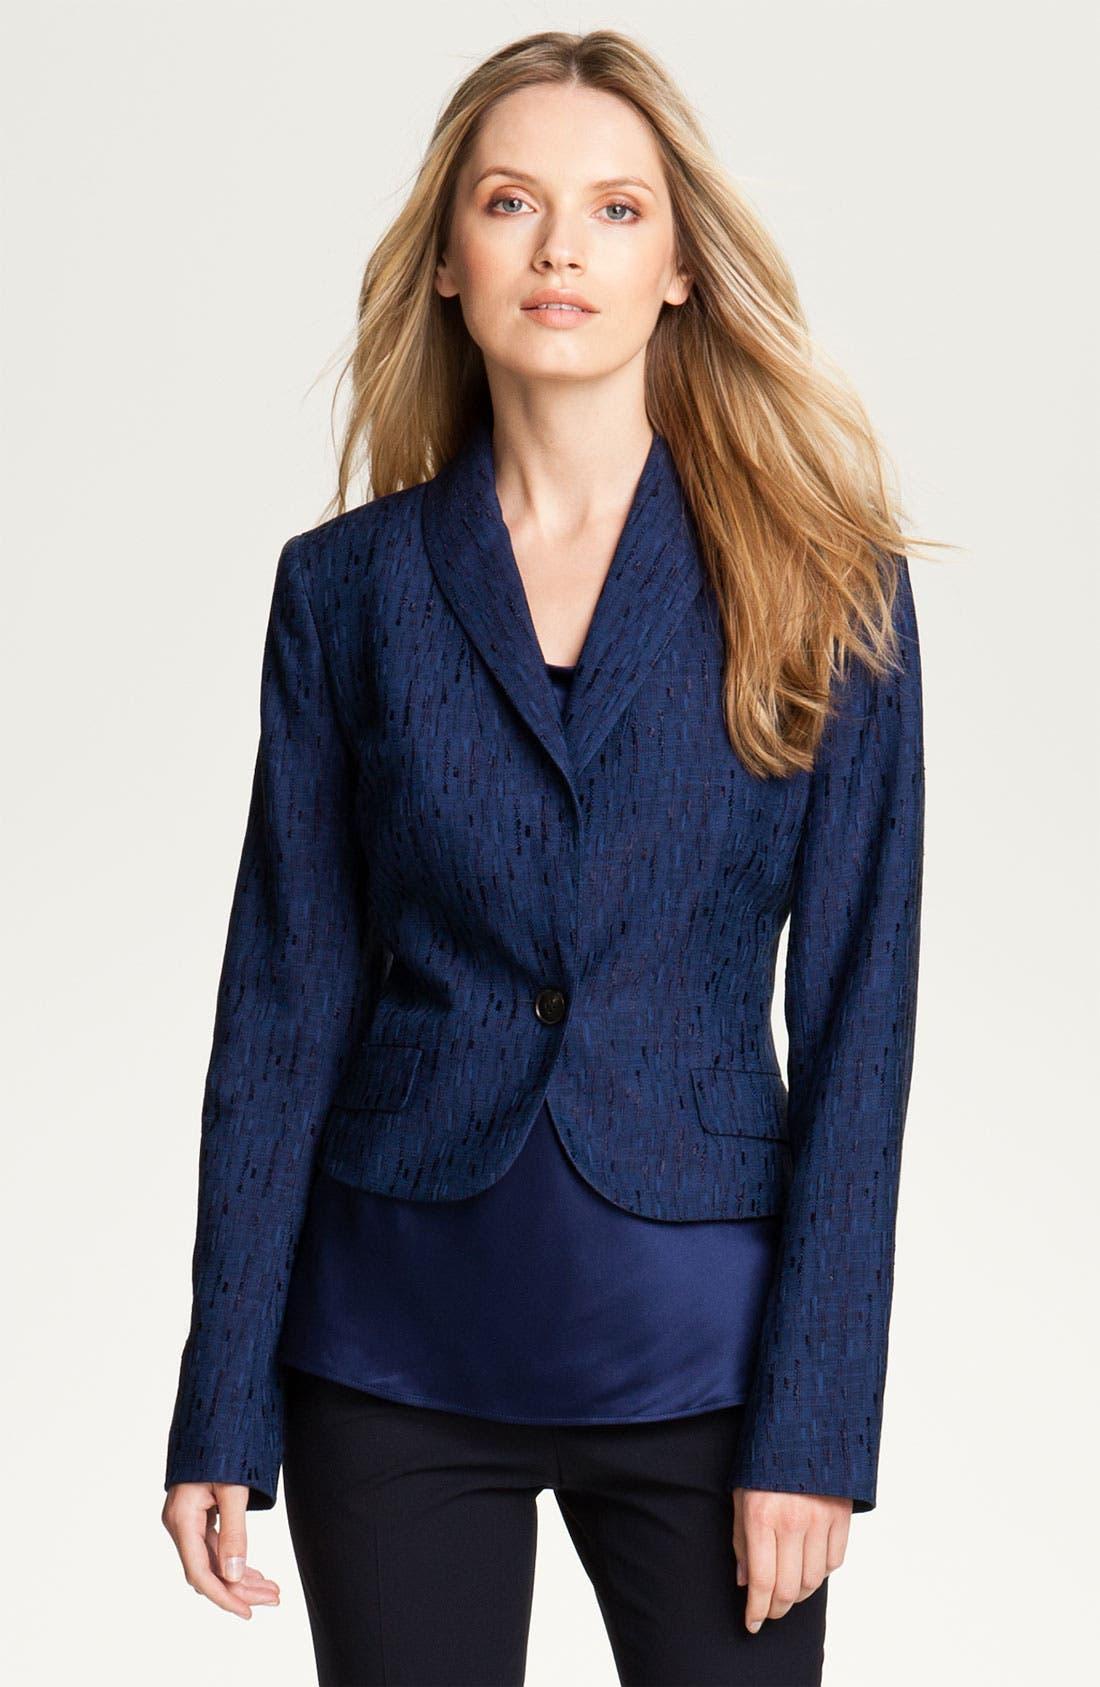 Alternate Image 1 Selected - Lafayette 148 New York 'Sublime Texture' Jacket (Petite)